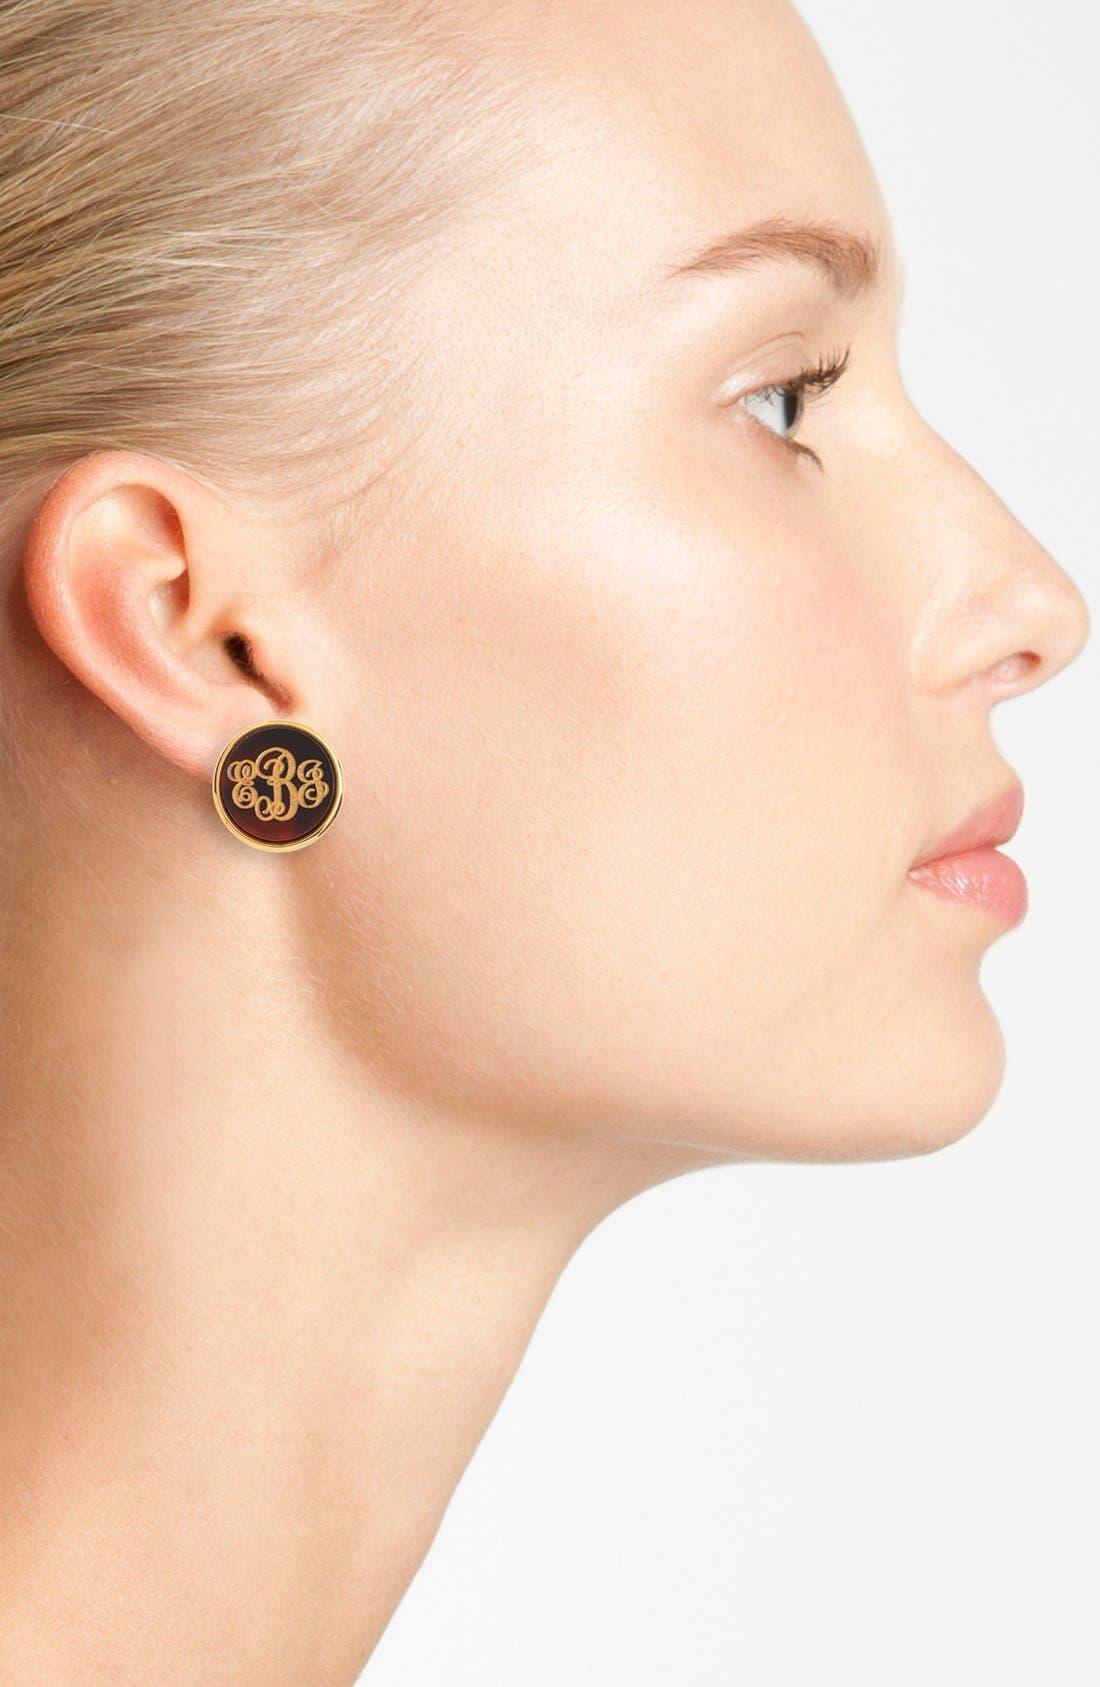 'Vineyard' Personalized Monogram Stud Earrings,                             Alternate thumbnail 2, color,                             Tortoise